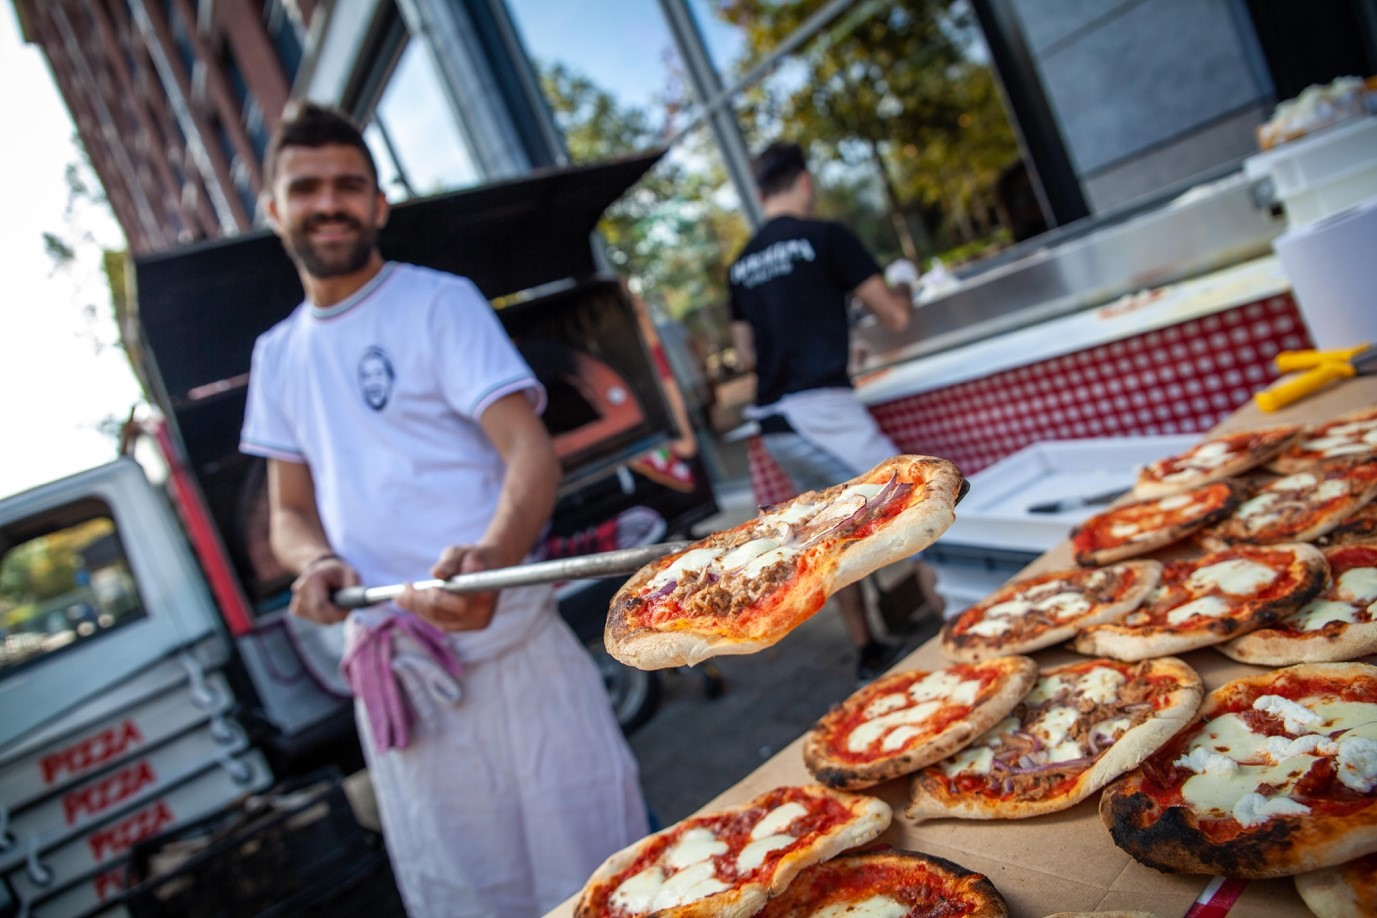 godatafest-data-technology-lunch-pizza-godatadriven